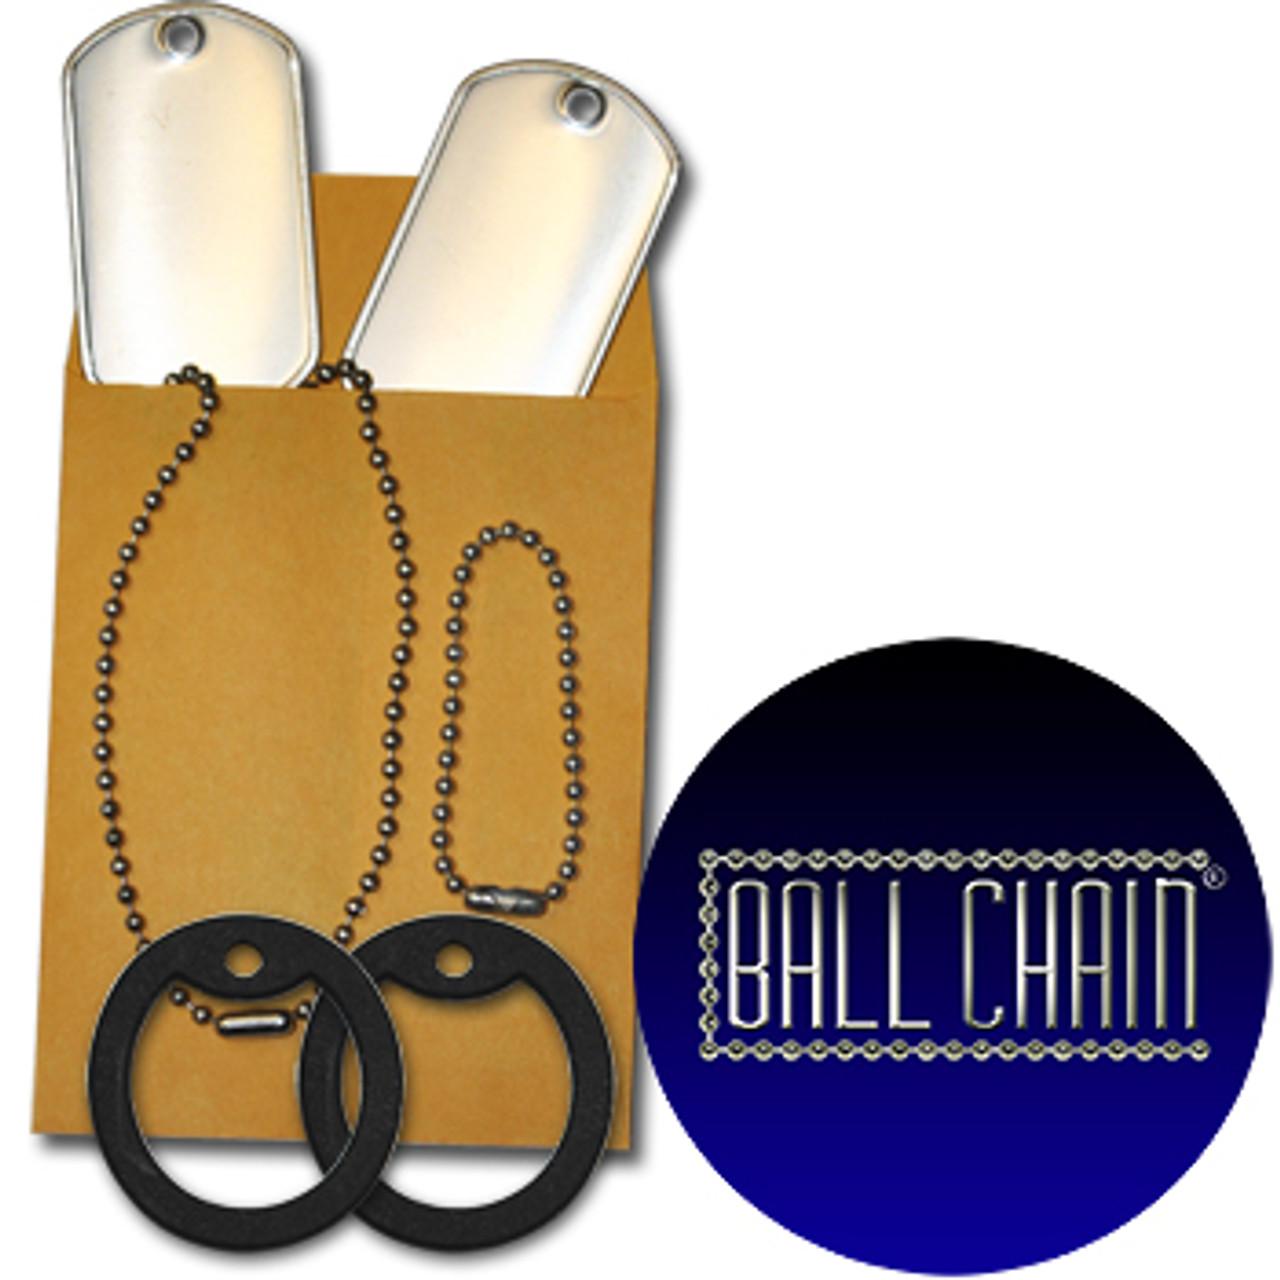 Custom Dog Tag 5 Pack (5 Dog Tags, 5 Chains, & 5 Silencers)